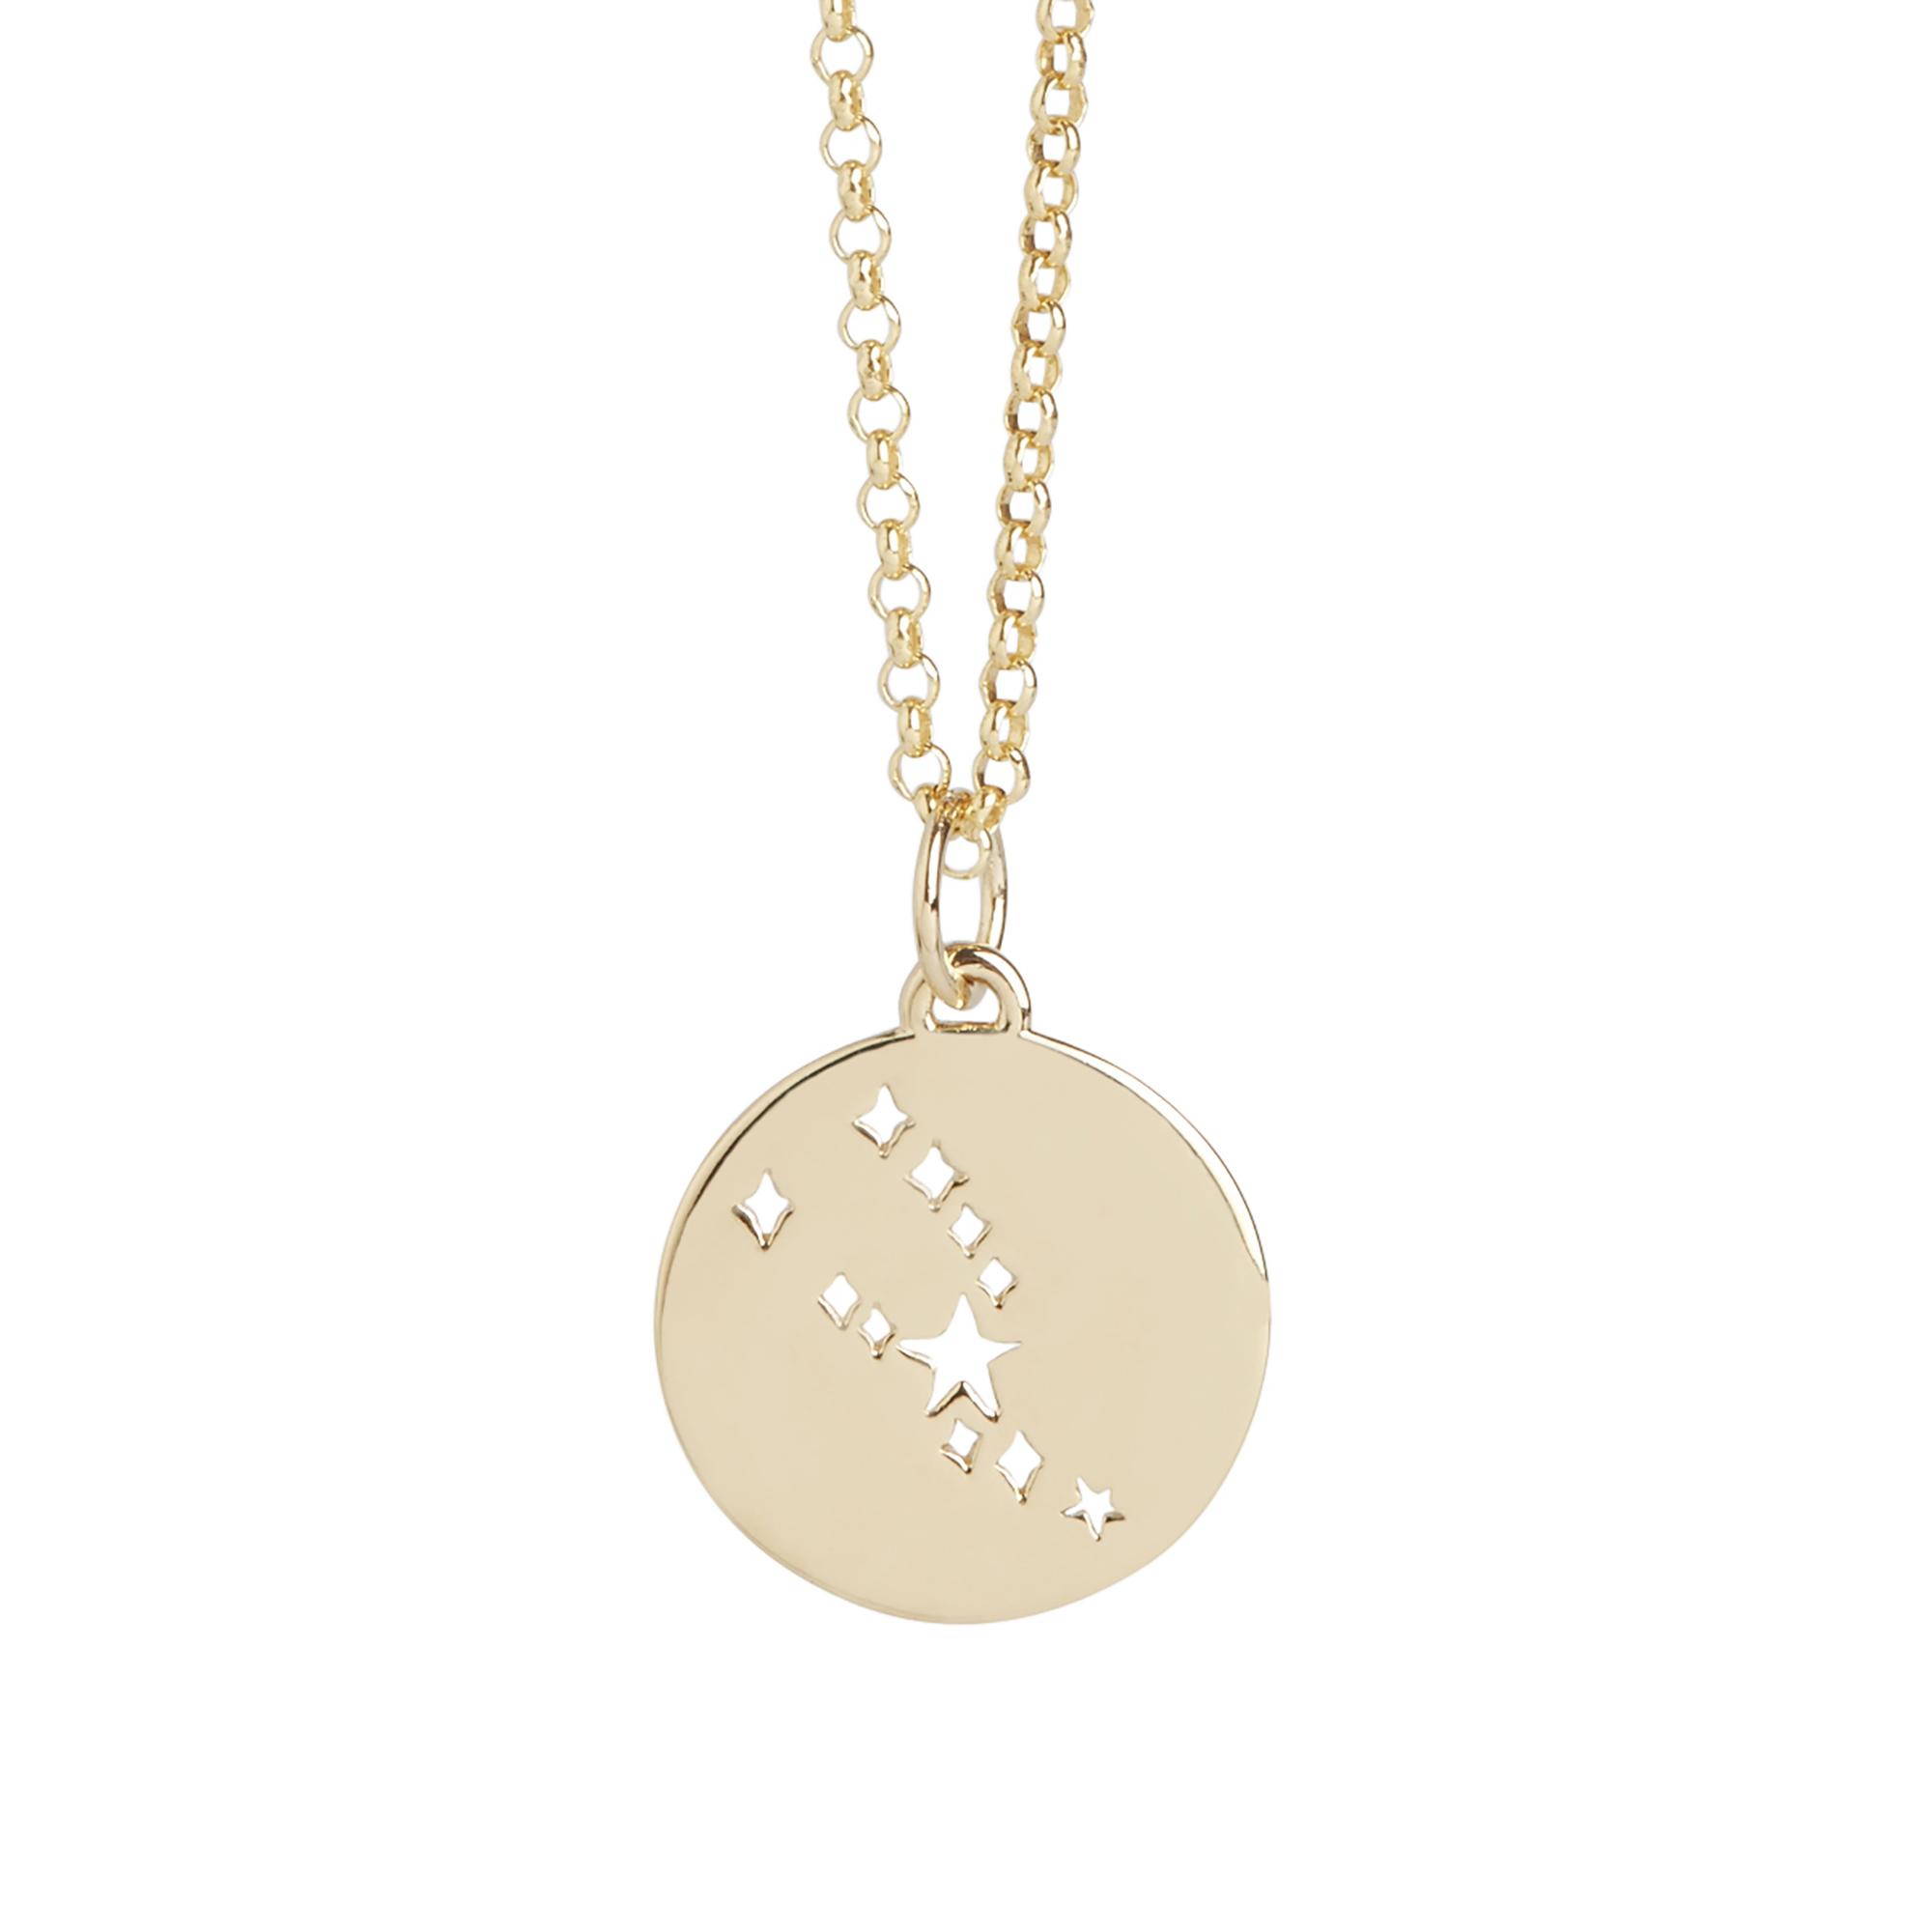 Muru Taurus Star Sign Necklace Gold Plated